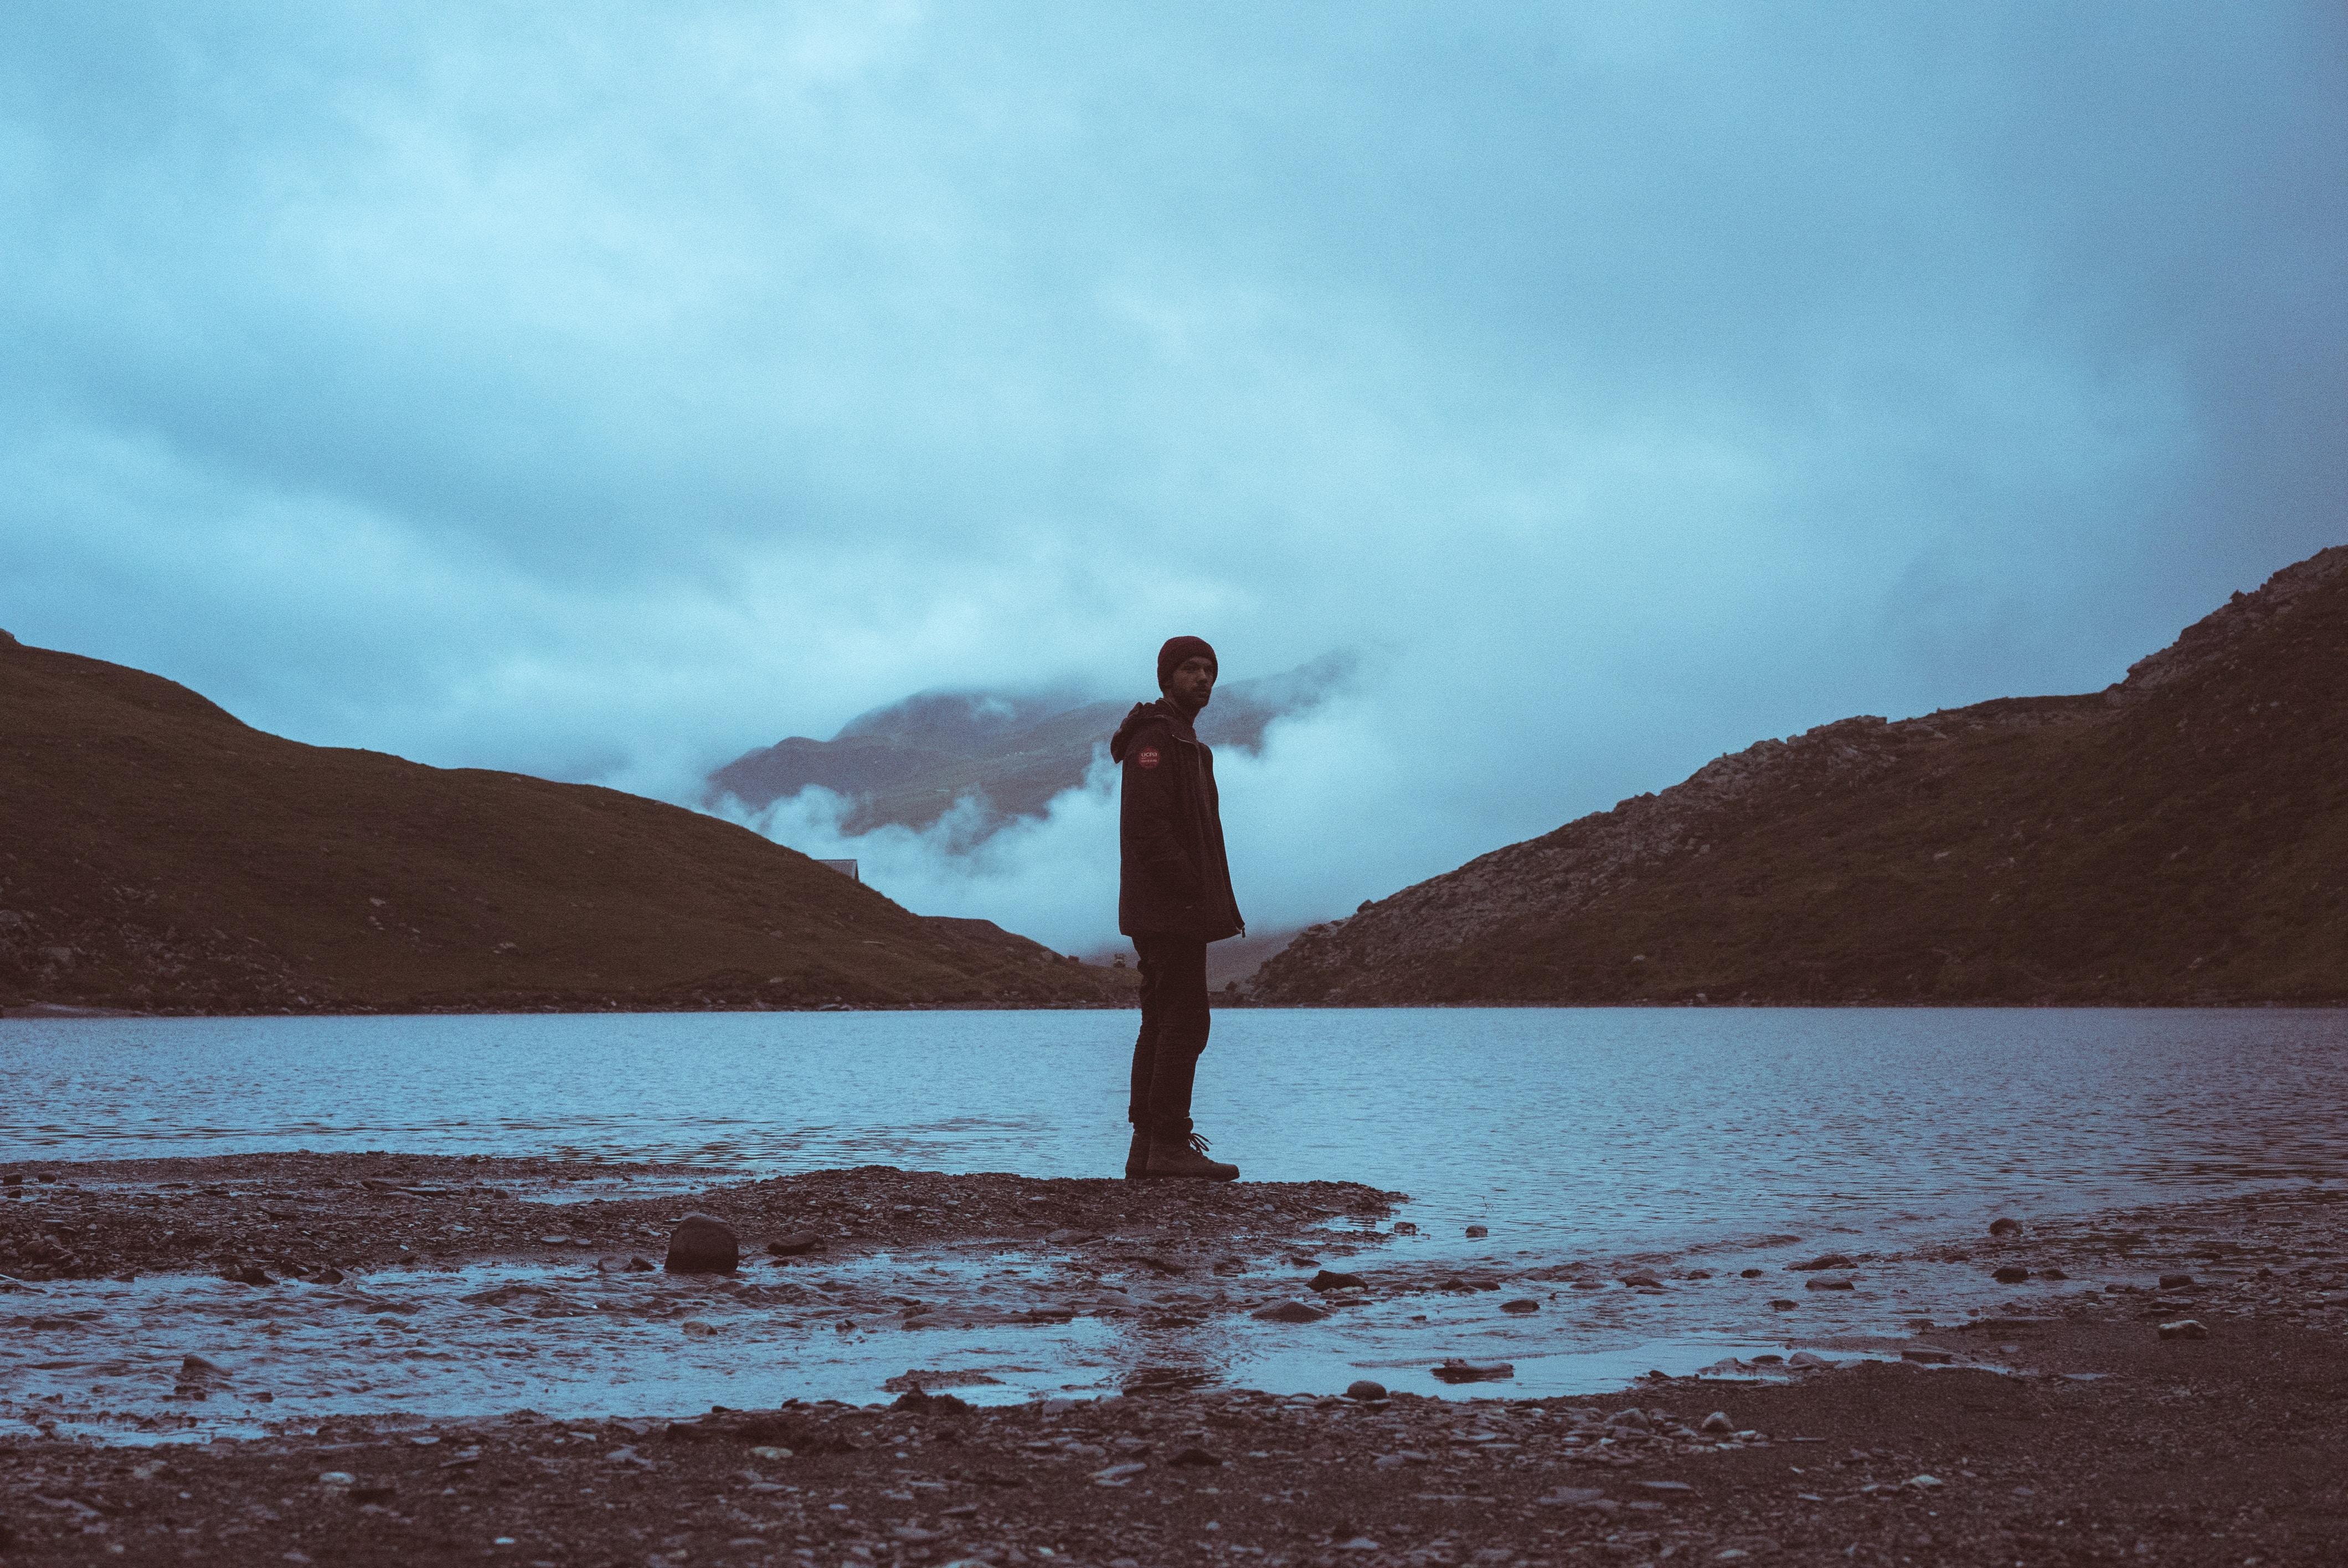 man standing on shoreline